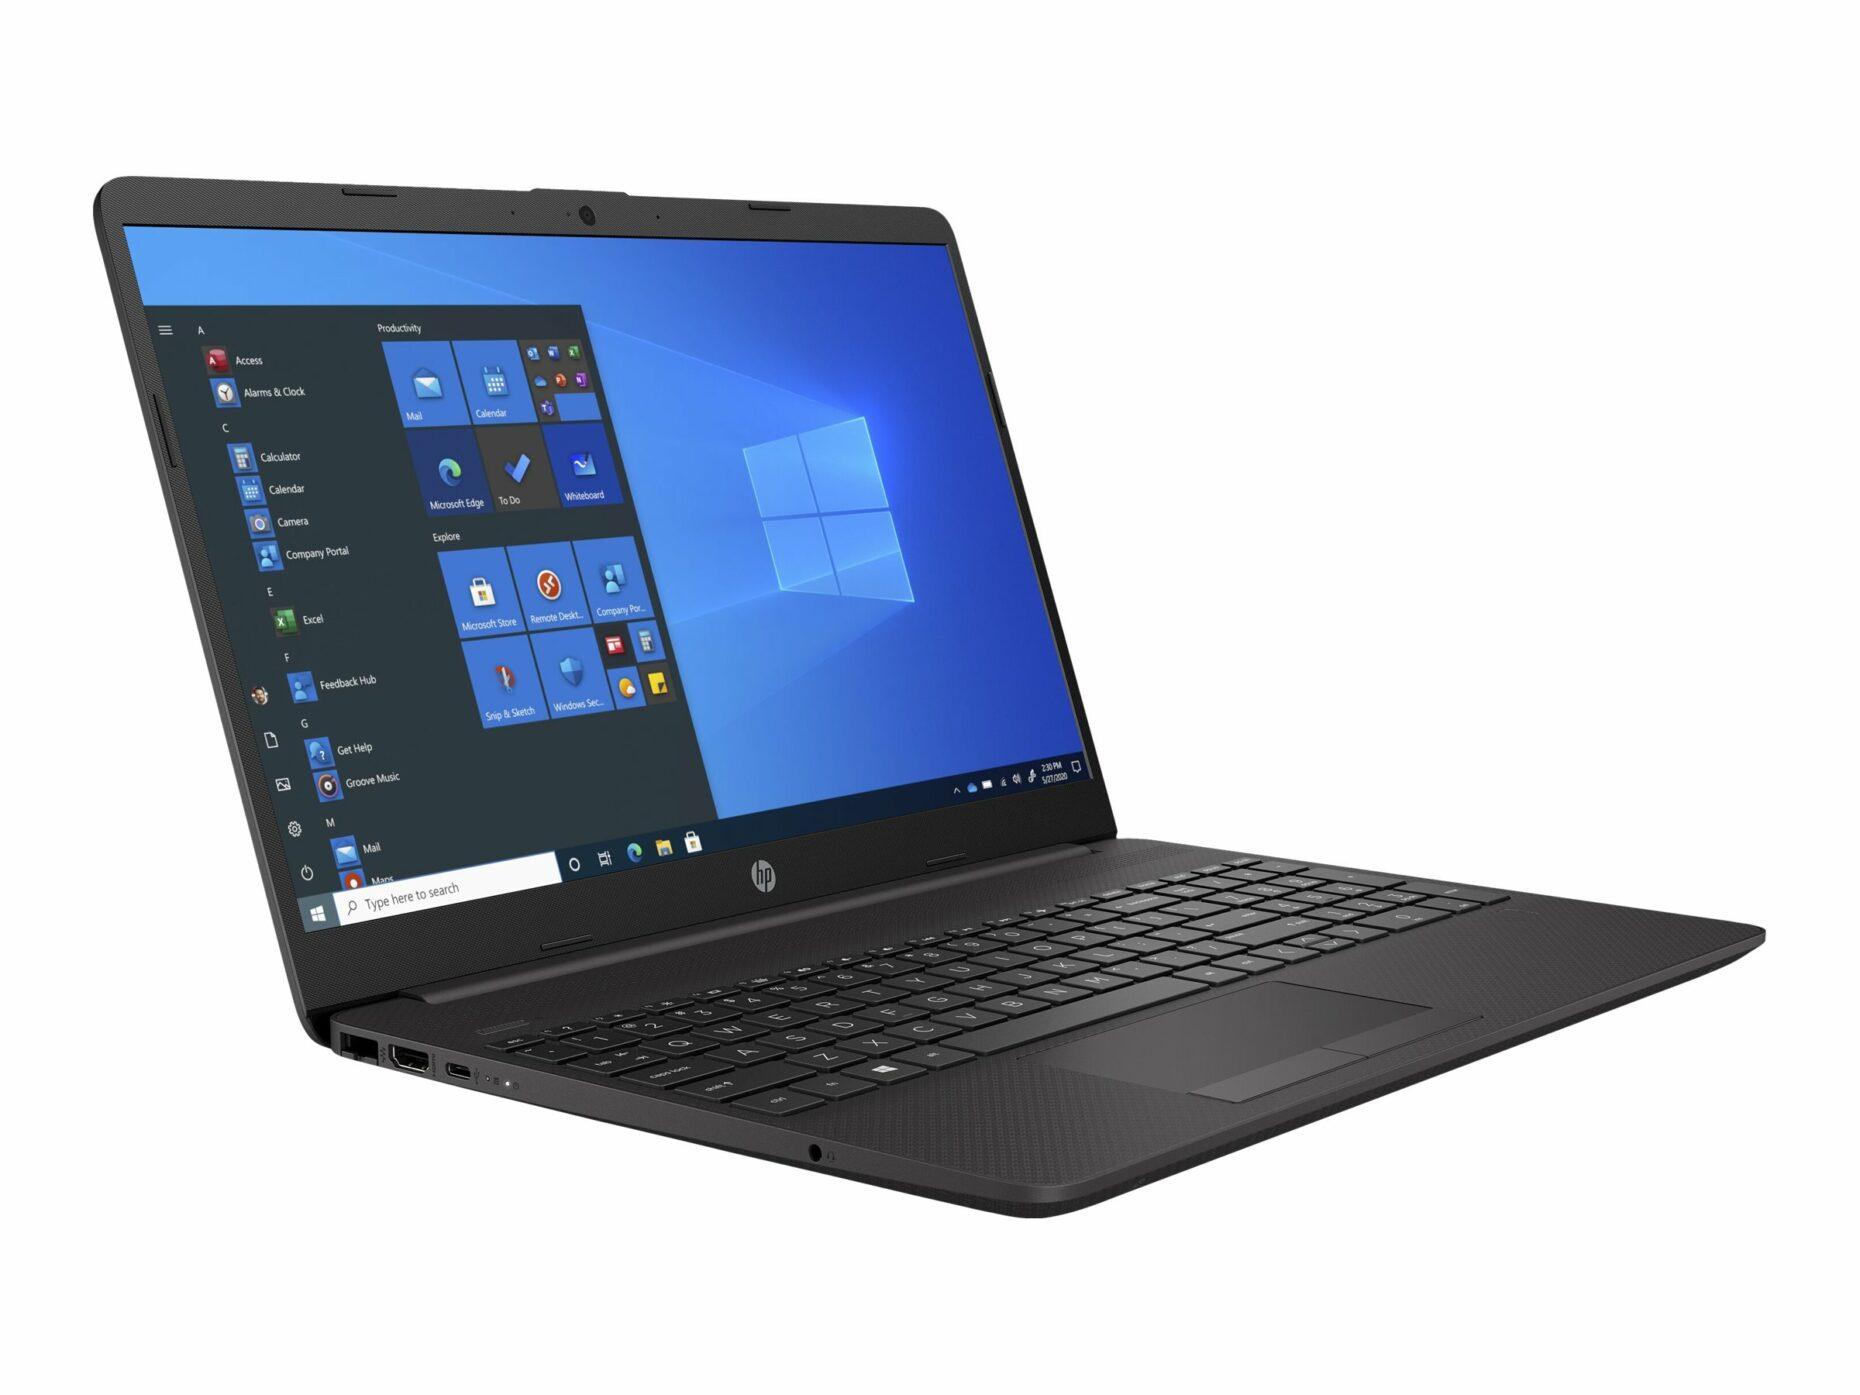 "HP 255 G8 - AMD Ryzen 3 3250U - 8 GB RAM - 256 GB SSD - 15.6"" (Full HD) - Radeon Graphics - Notebook"